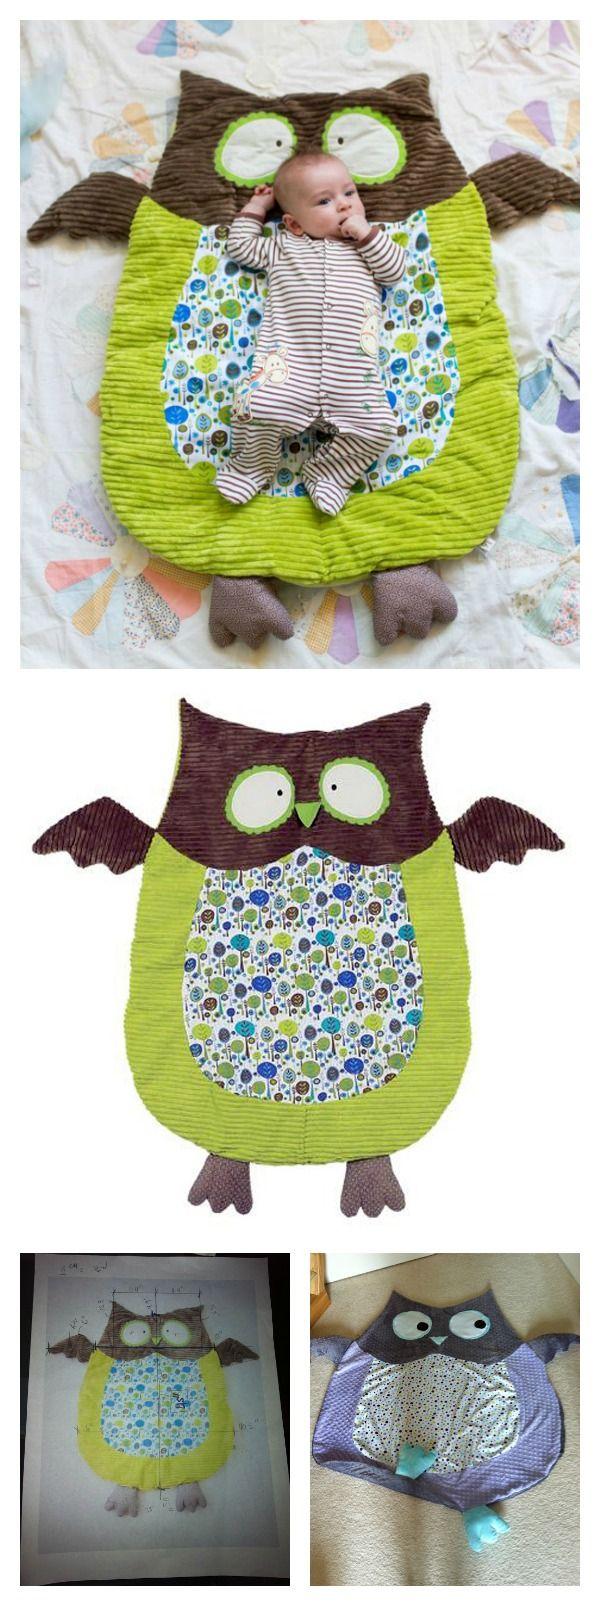 Best 25 owl blanket ideas on pinterest crochet owl blanket diy cute owl floor play mat bankloansurffo Image collections